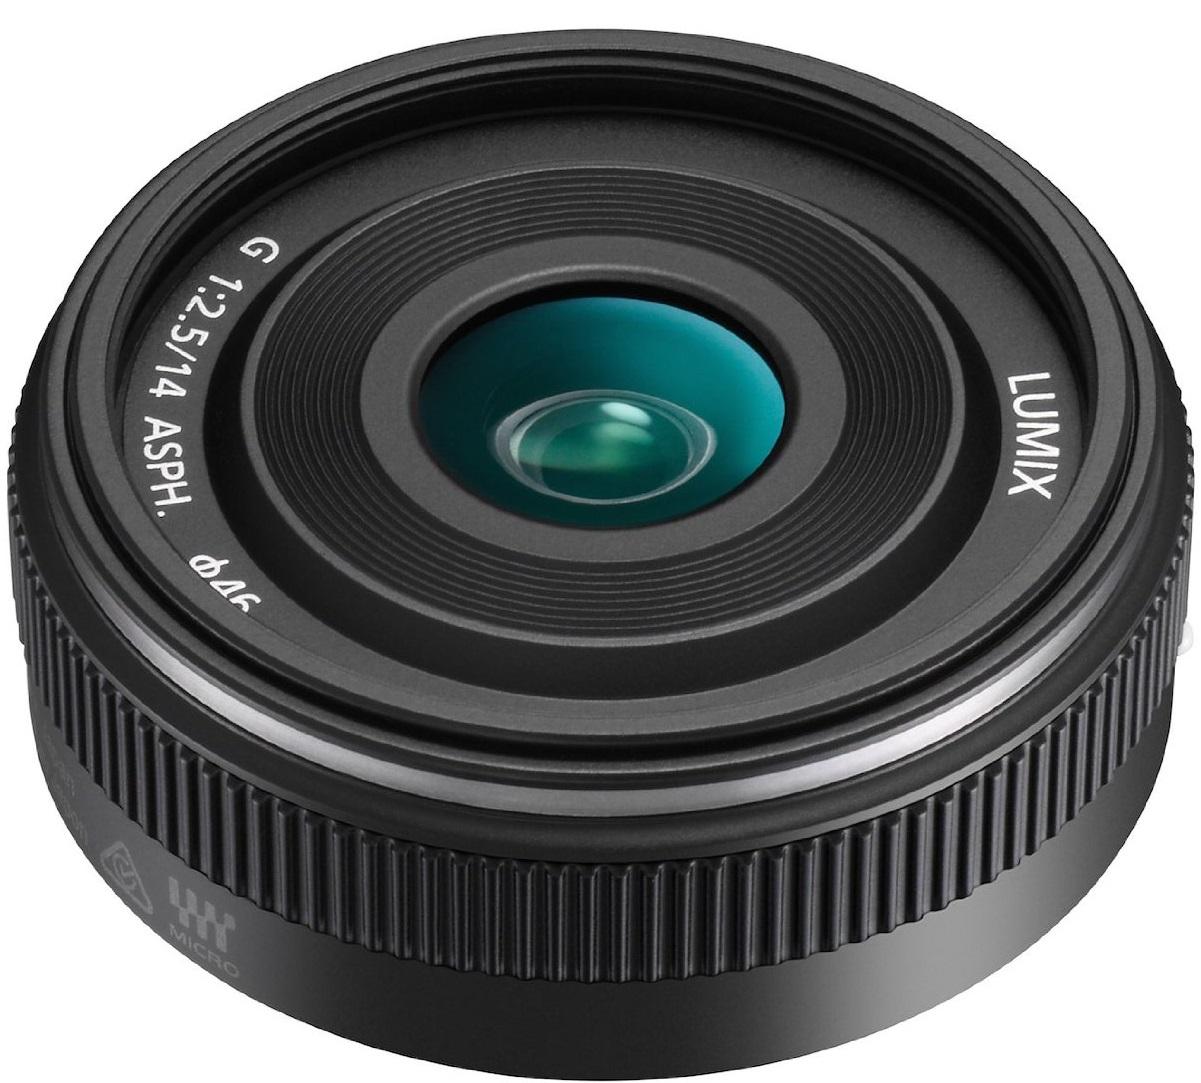 Panasonic Lumix G 14 mm 2.5 II Asph. 46 mm Filtergewinde (Panasonic Micro Fouor Third Anschluss)schwarz